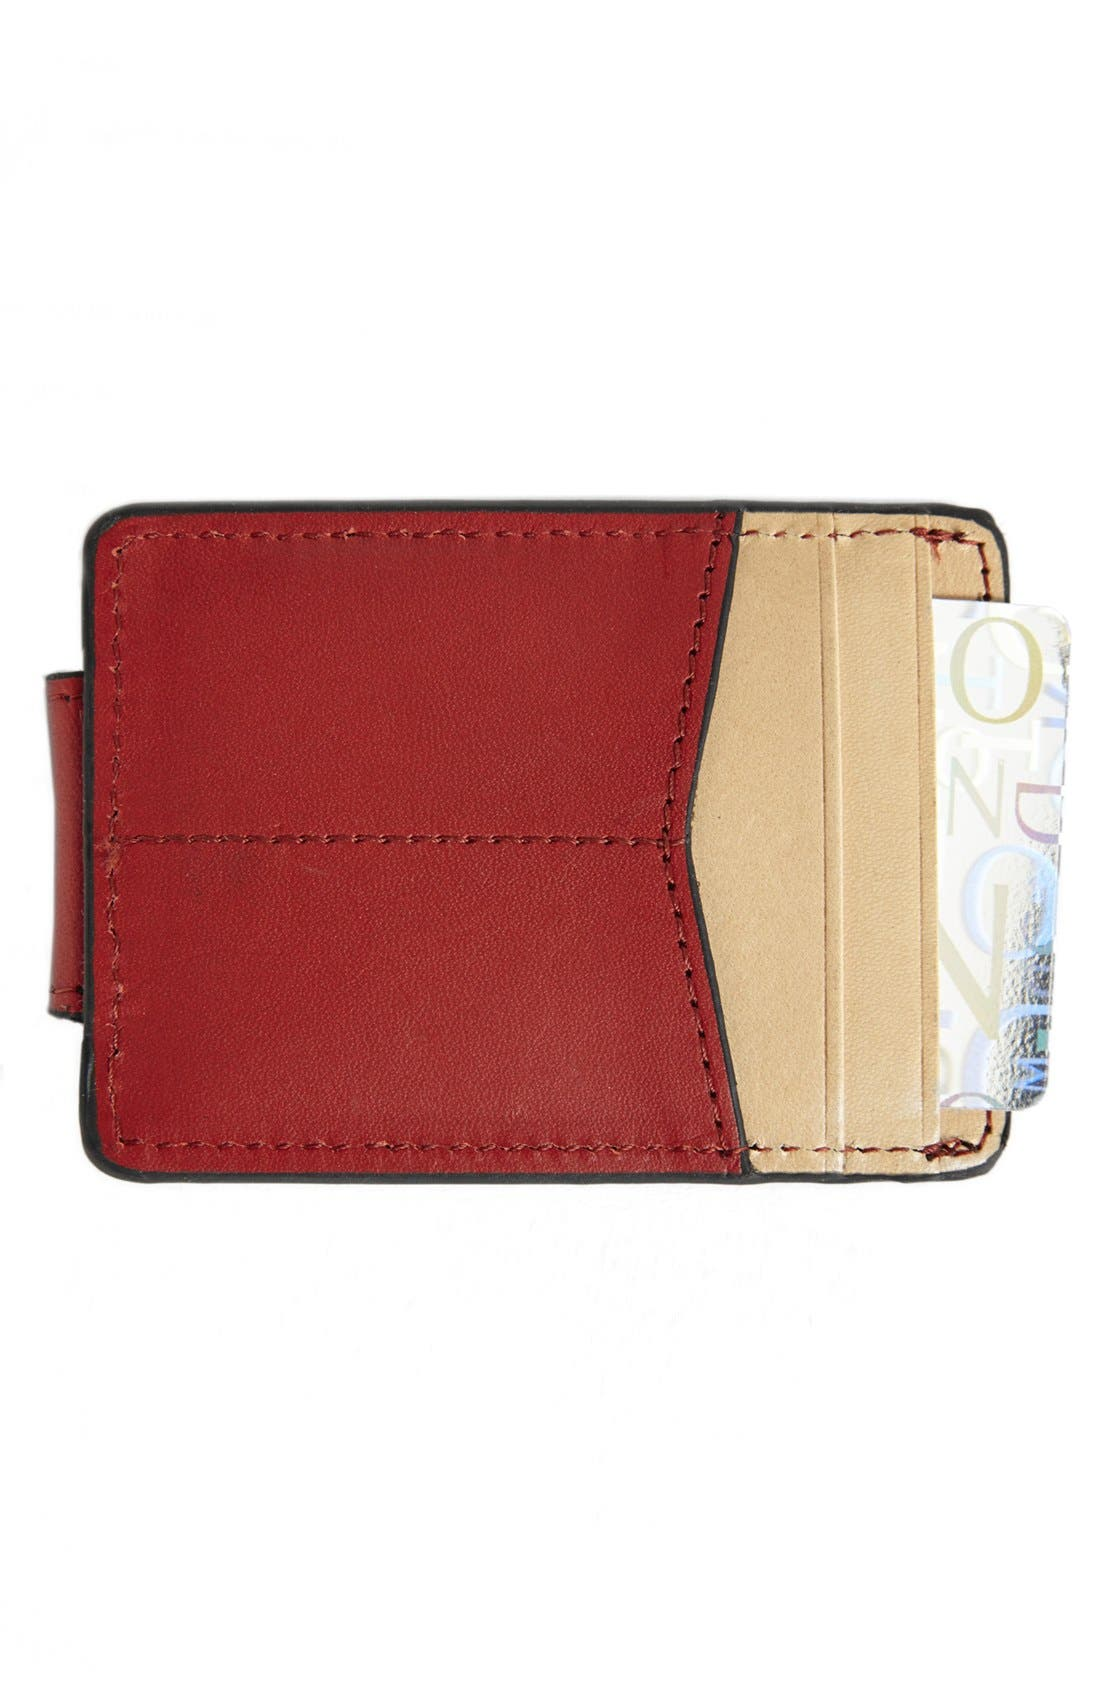 Alternate Image 1 Selected - J. Fold 'Thunderbird' Money Clip Wallet